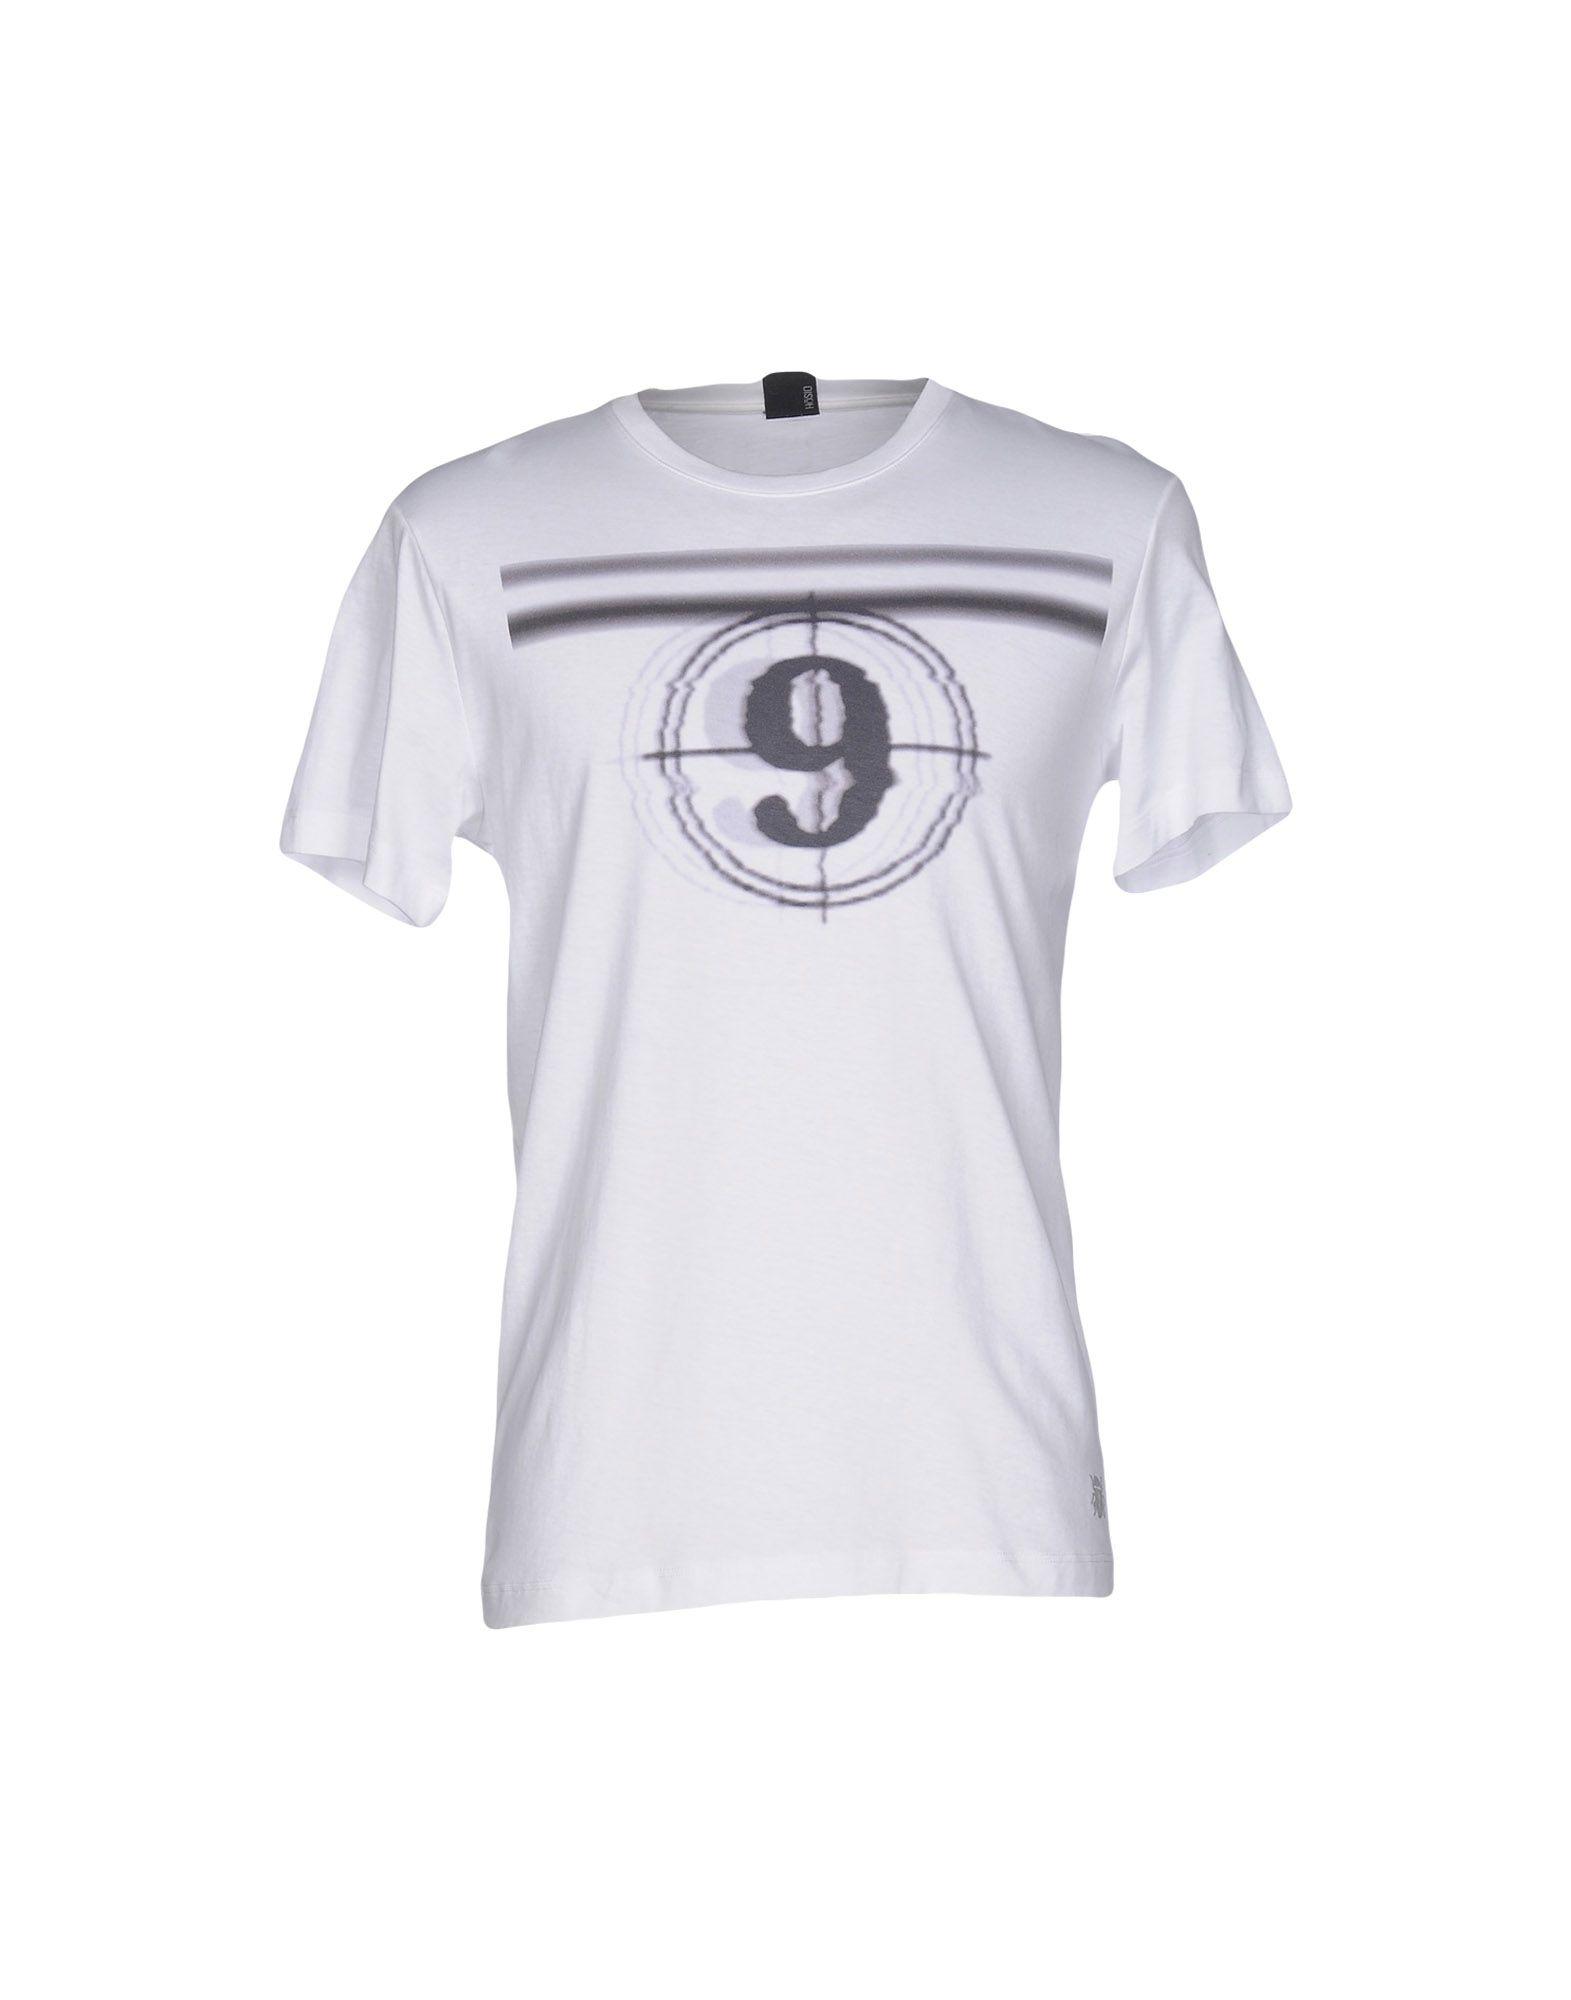 HōSIO Футболка футболка круглый вырез sis футболка круглый вырез